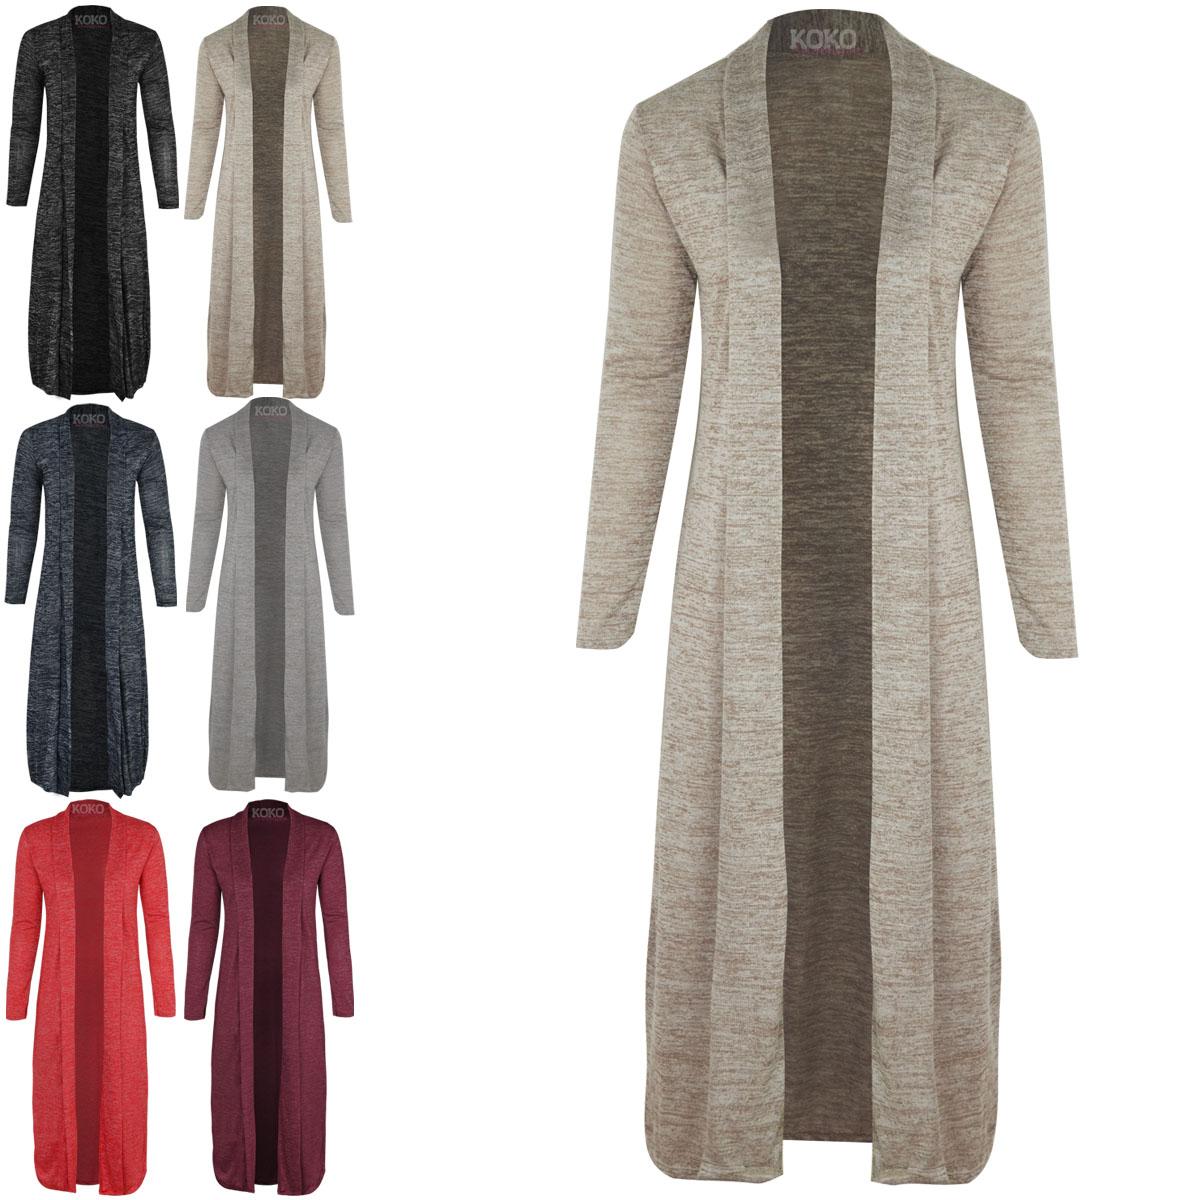 Amazon Seller Winter Fashion Sale